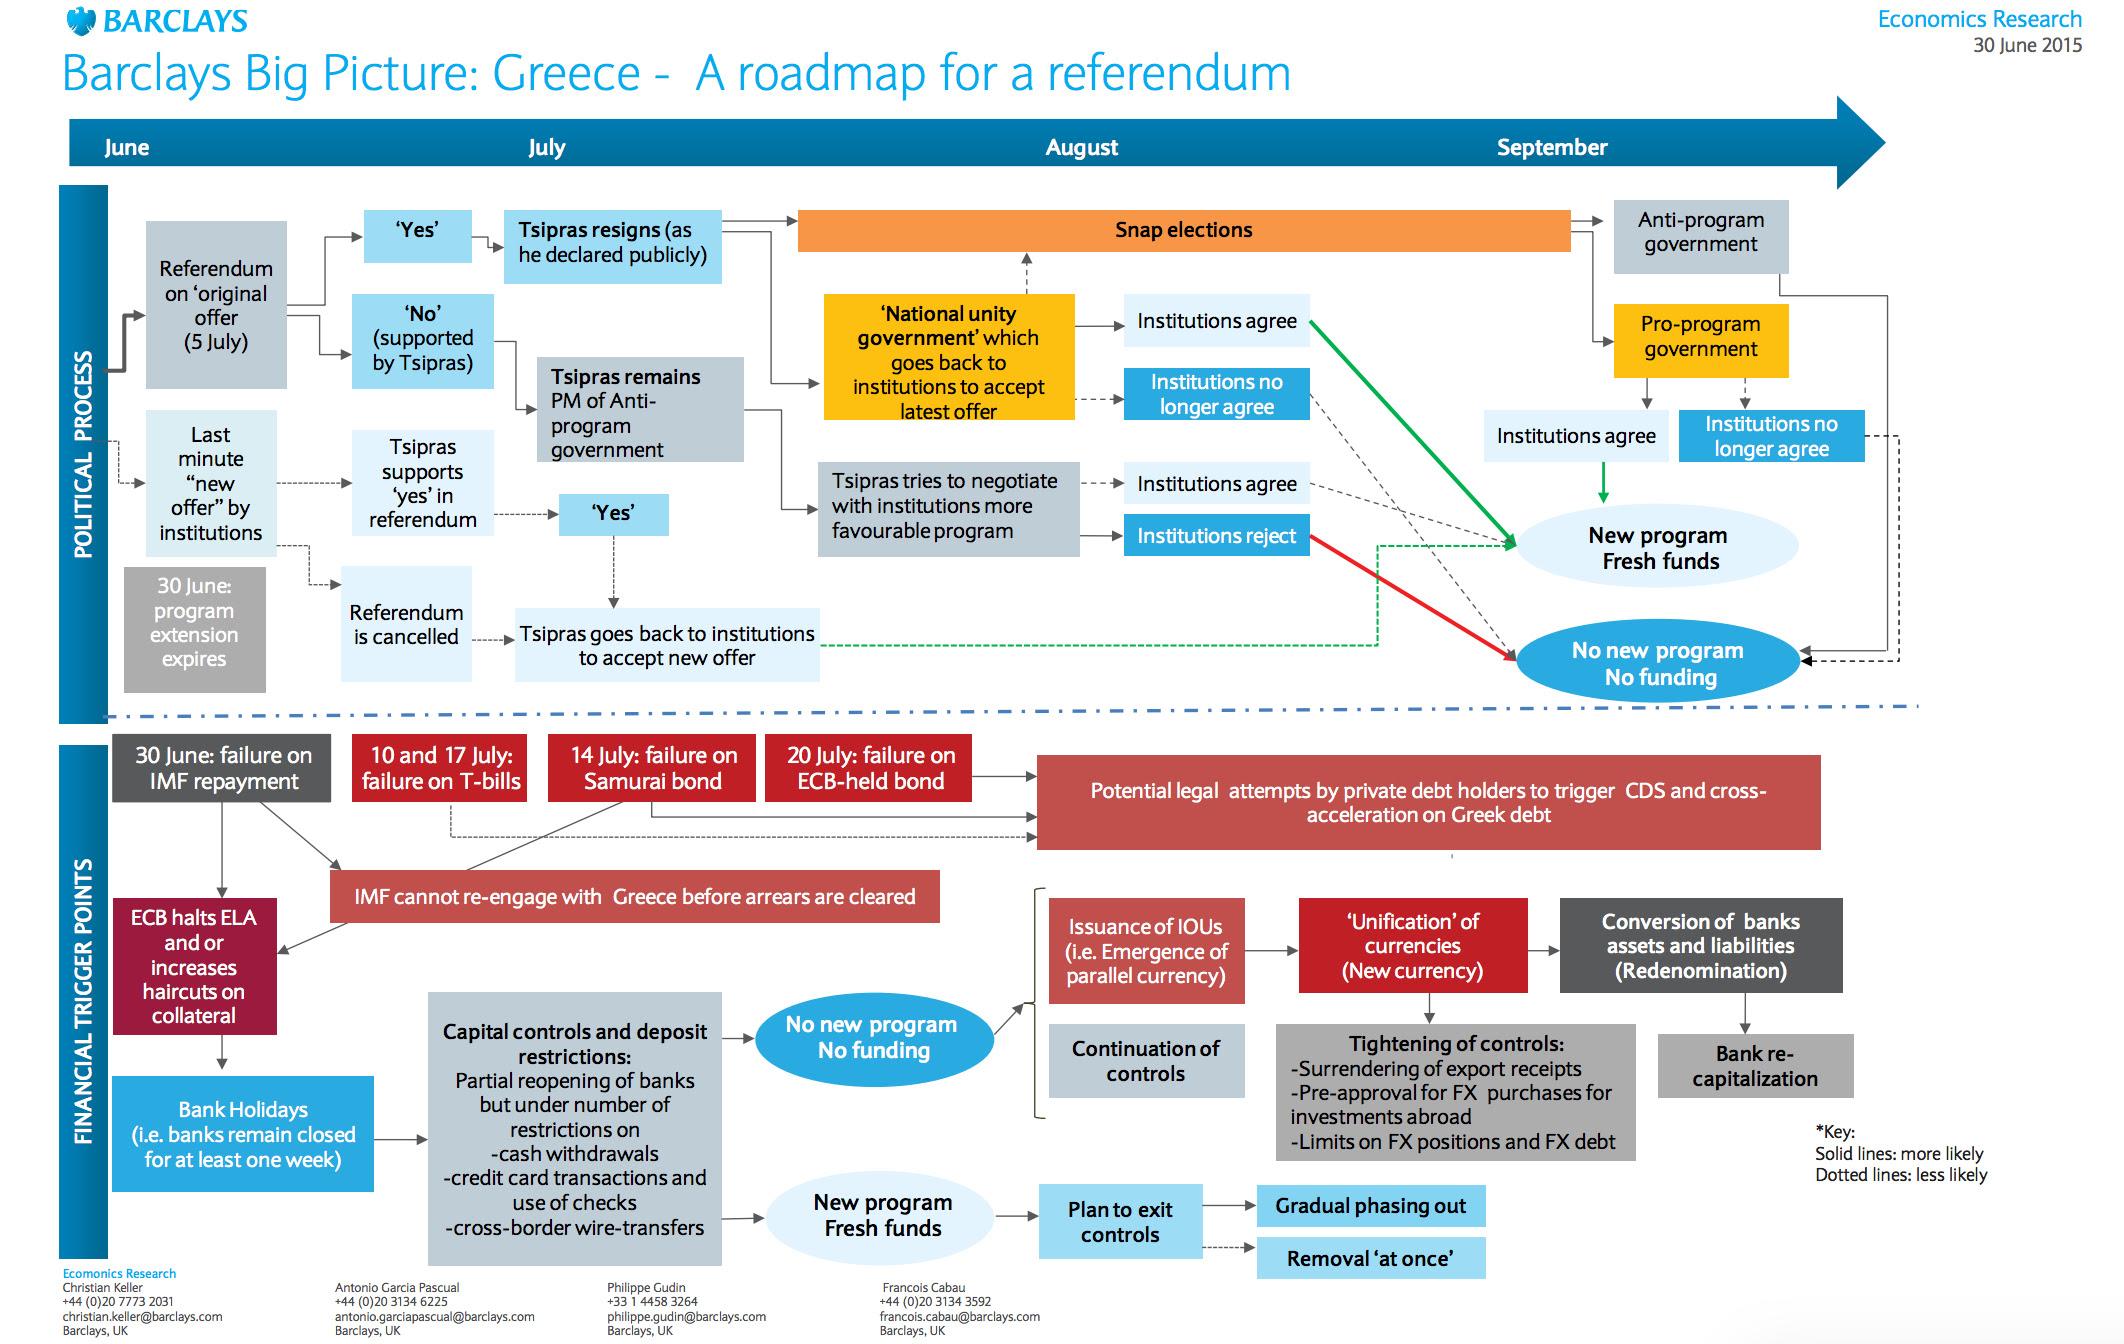 Fromhttp://www.zerohedge.com/news/2015-07-01/next-steps-greece-complete-post-referendum-roadmap